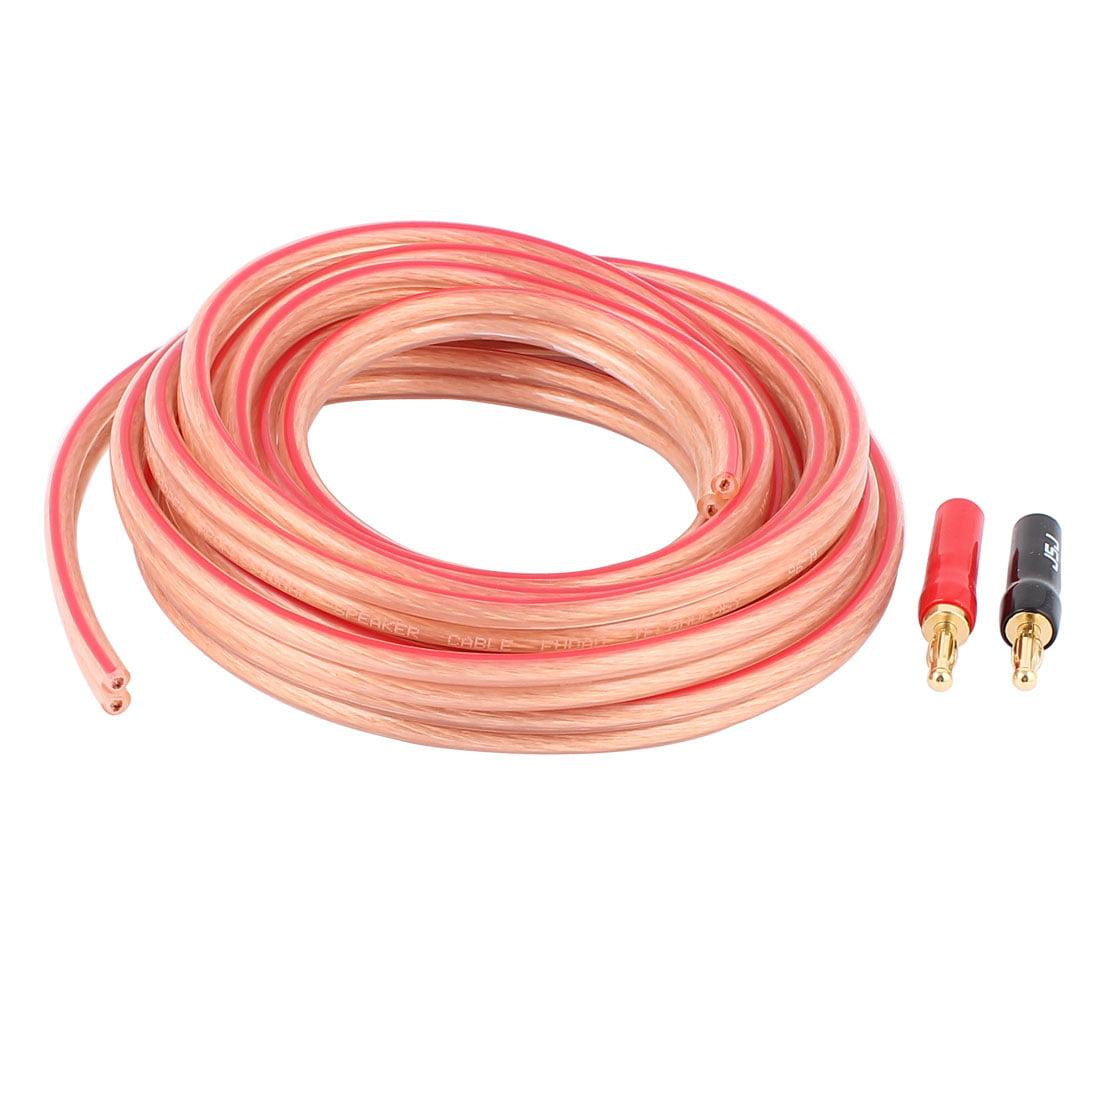 Unique Bargains 3 Meter 9.8 Ft Speaker 600 Fine Copper Wire Core Cable w 2 Connector